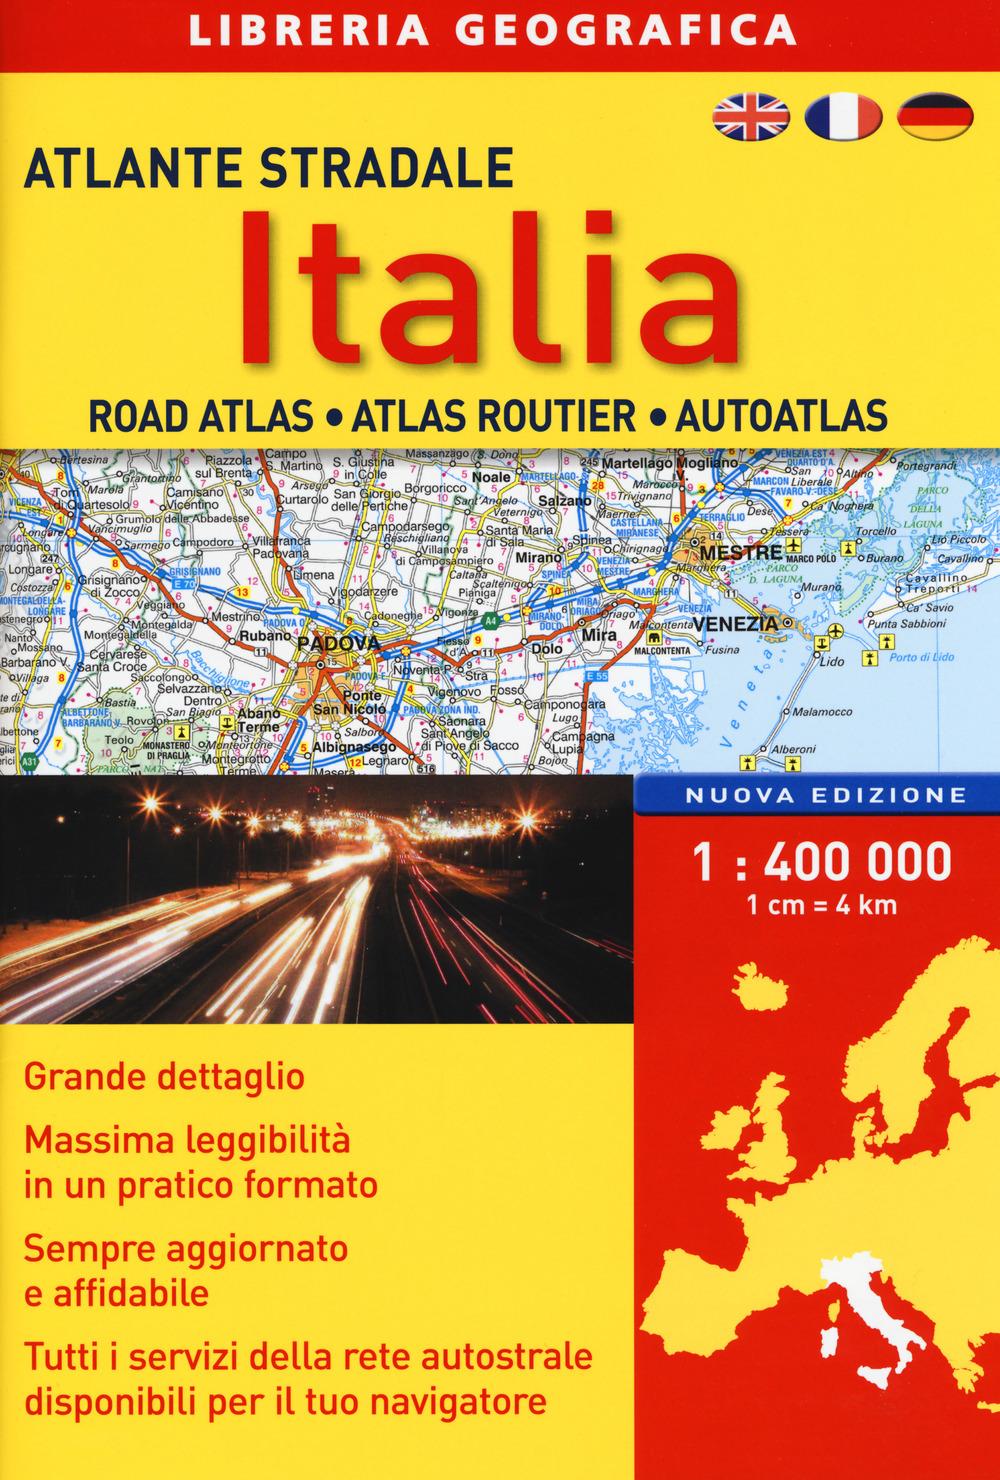 Image of Atlante stradale Italia 1:400.000